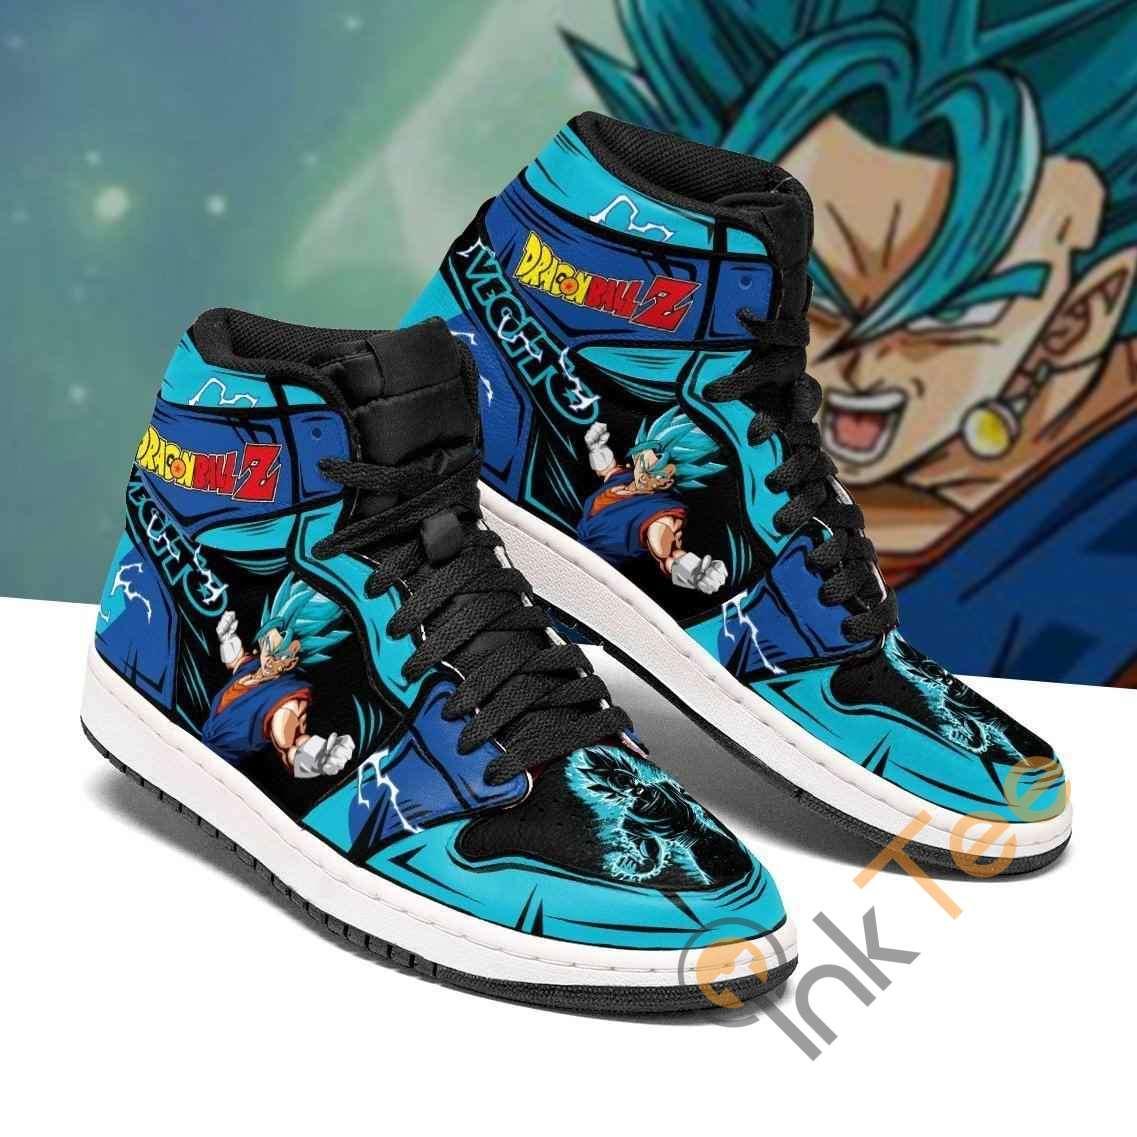 Vegito Blue Dragon Ball Z Anime Sneakers Air Jordan Shoes